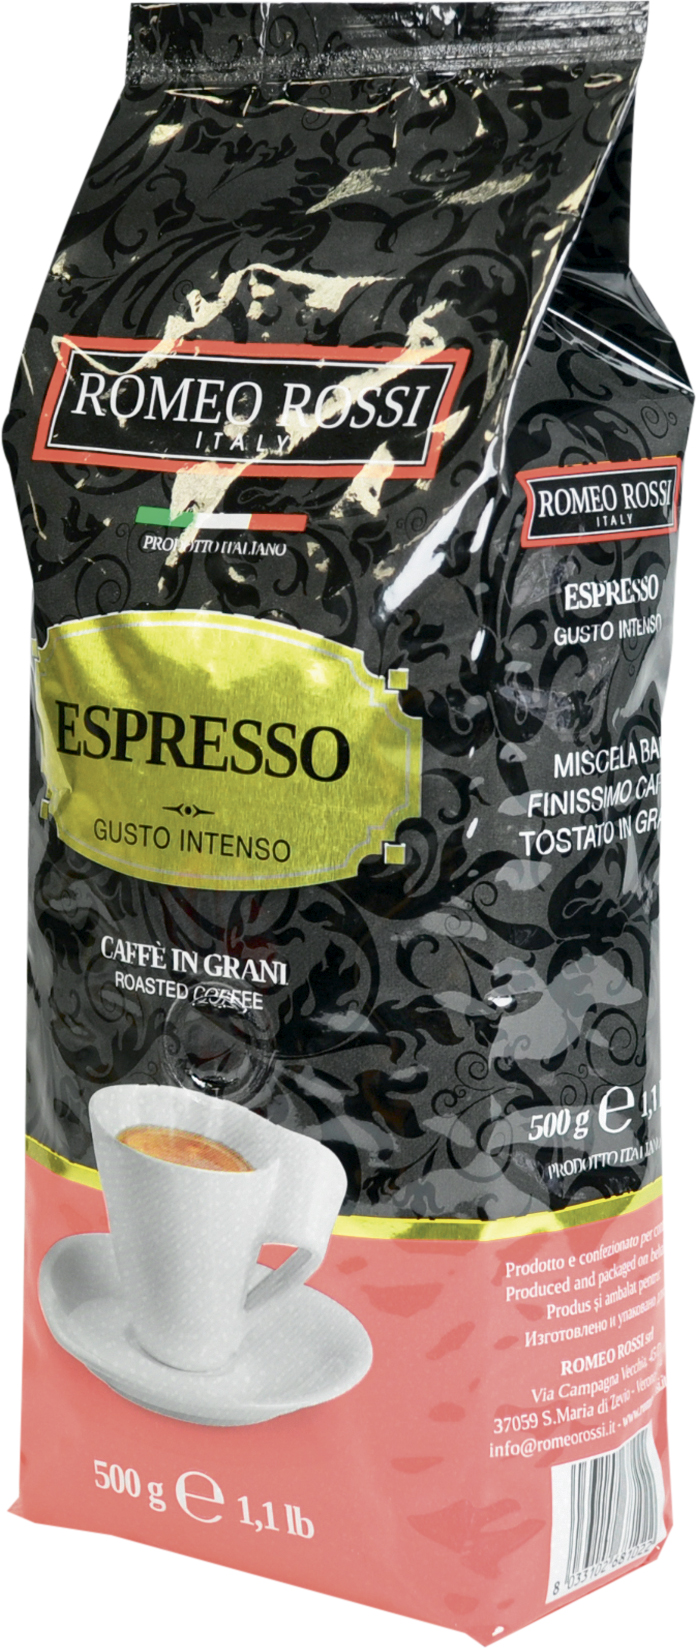 Romeo Rossi Crema кофе купить